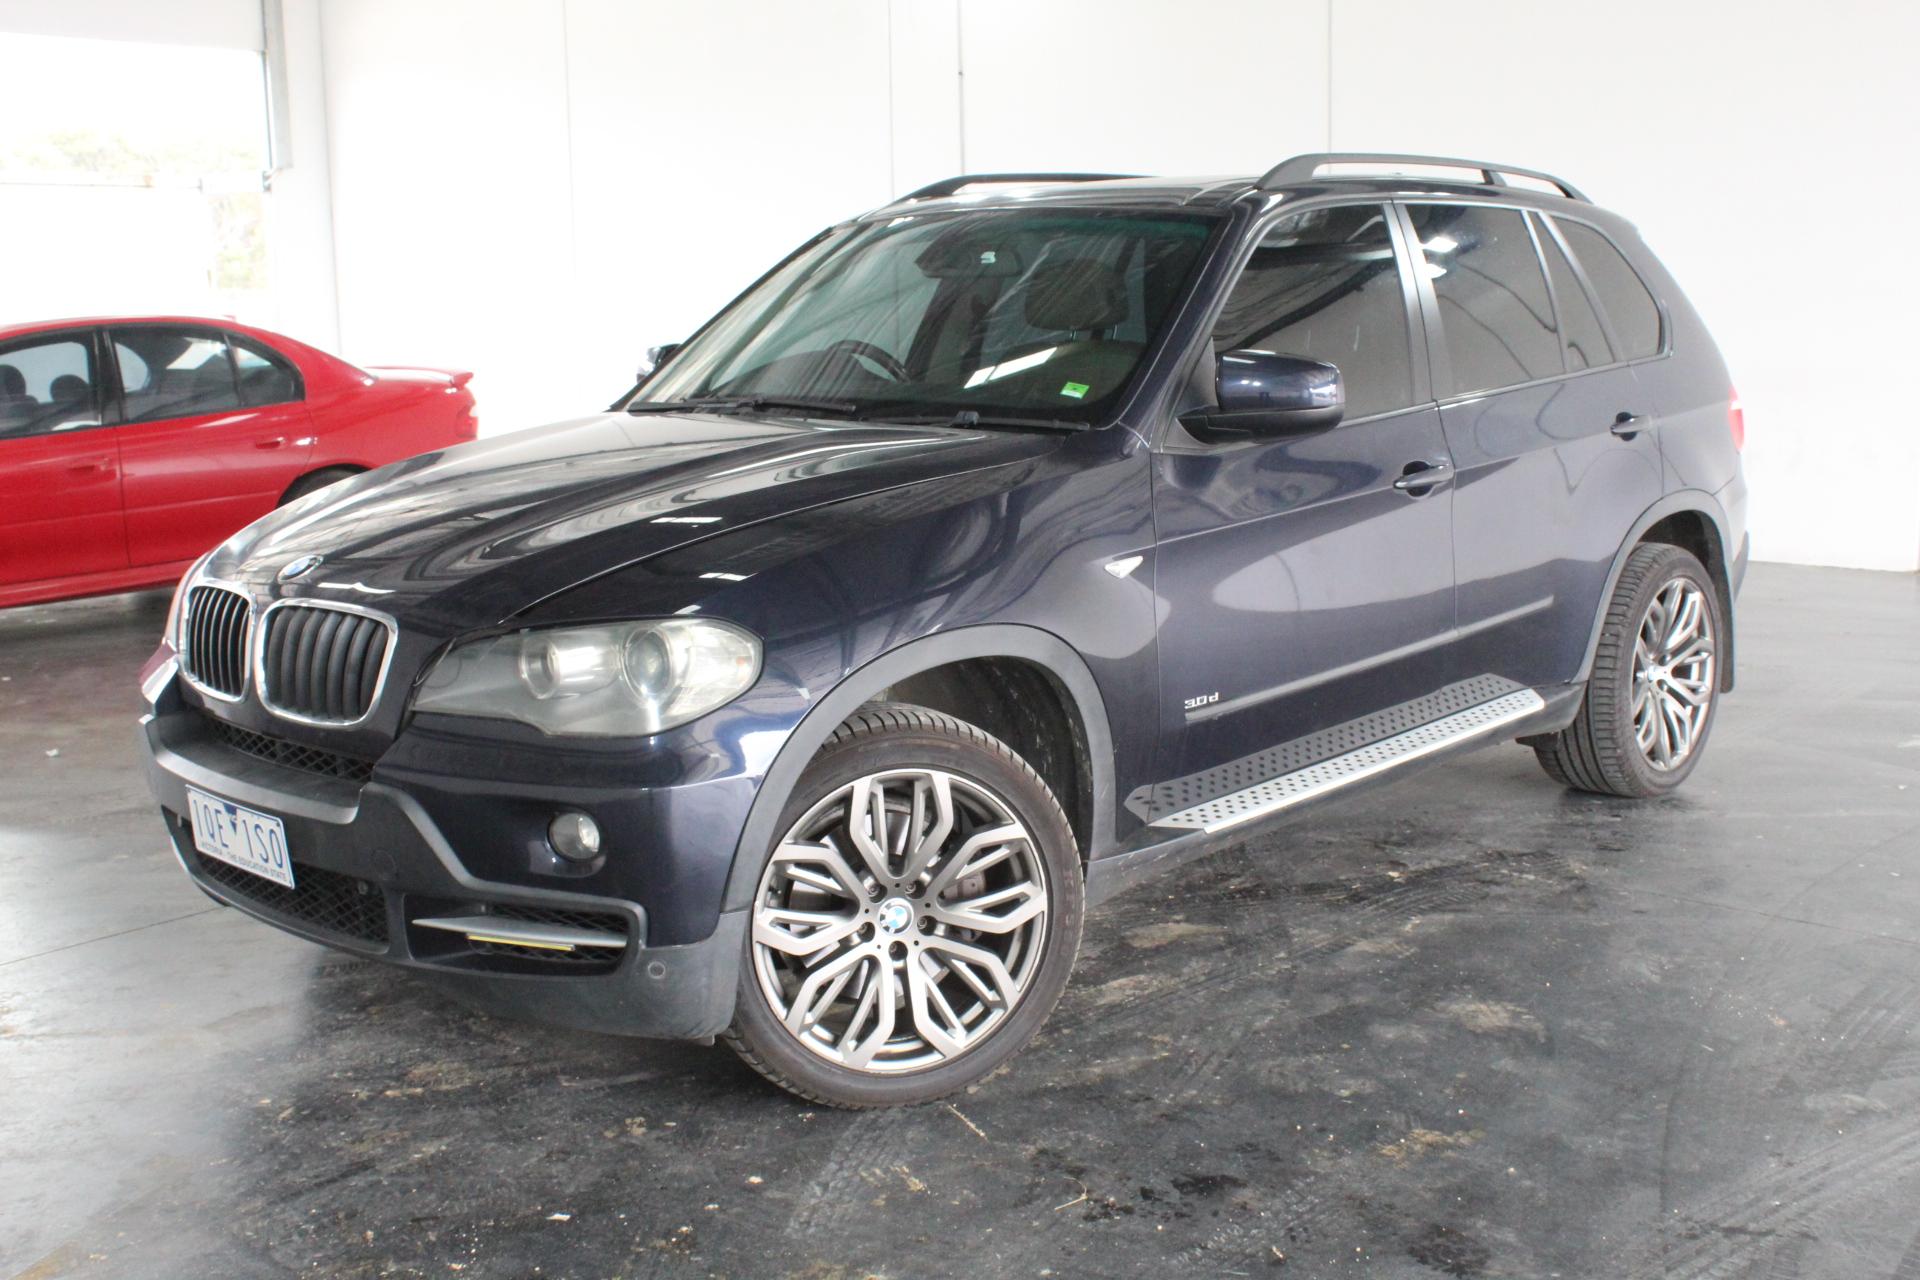 BMW X5 3.0d E70 Turbo Diesel Automatic Wagon